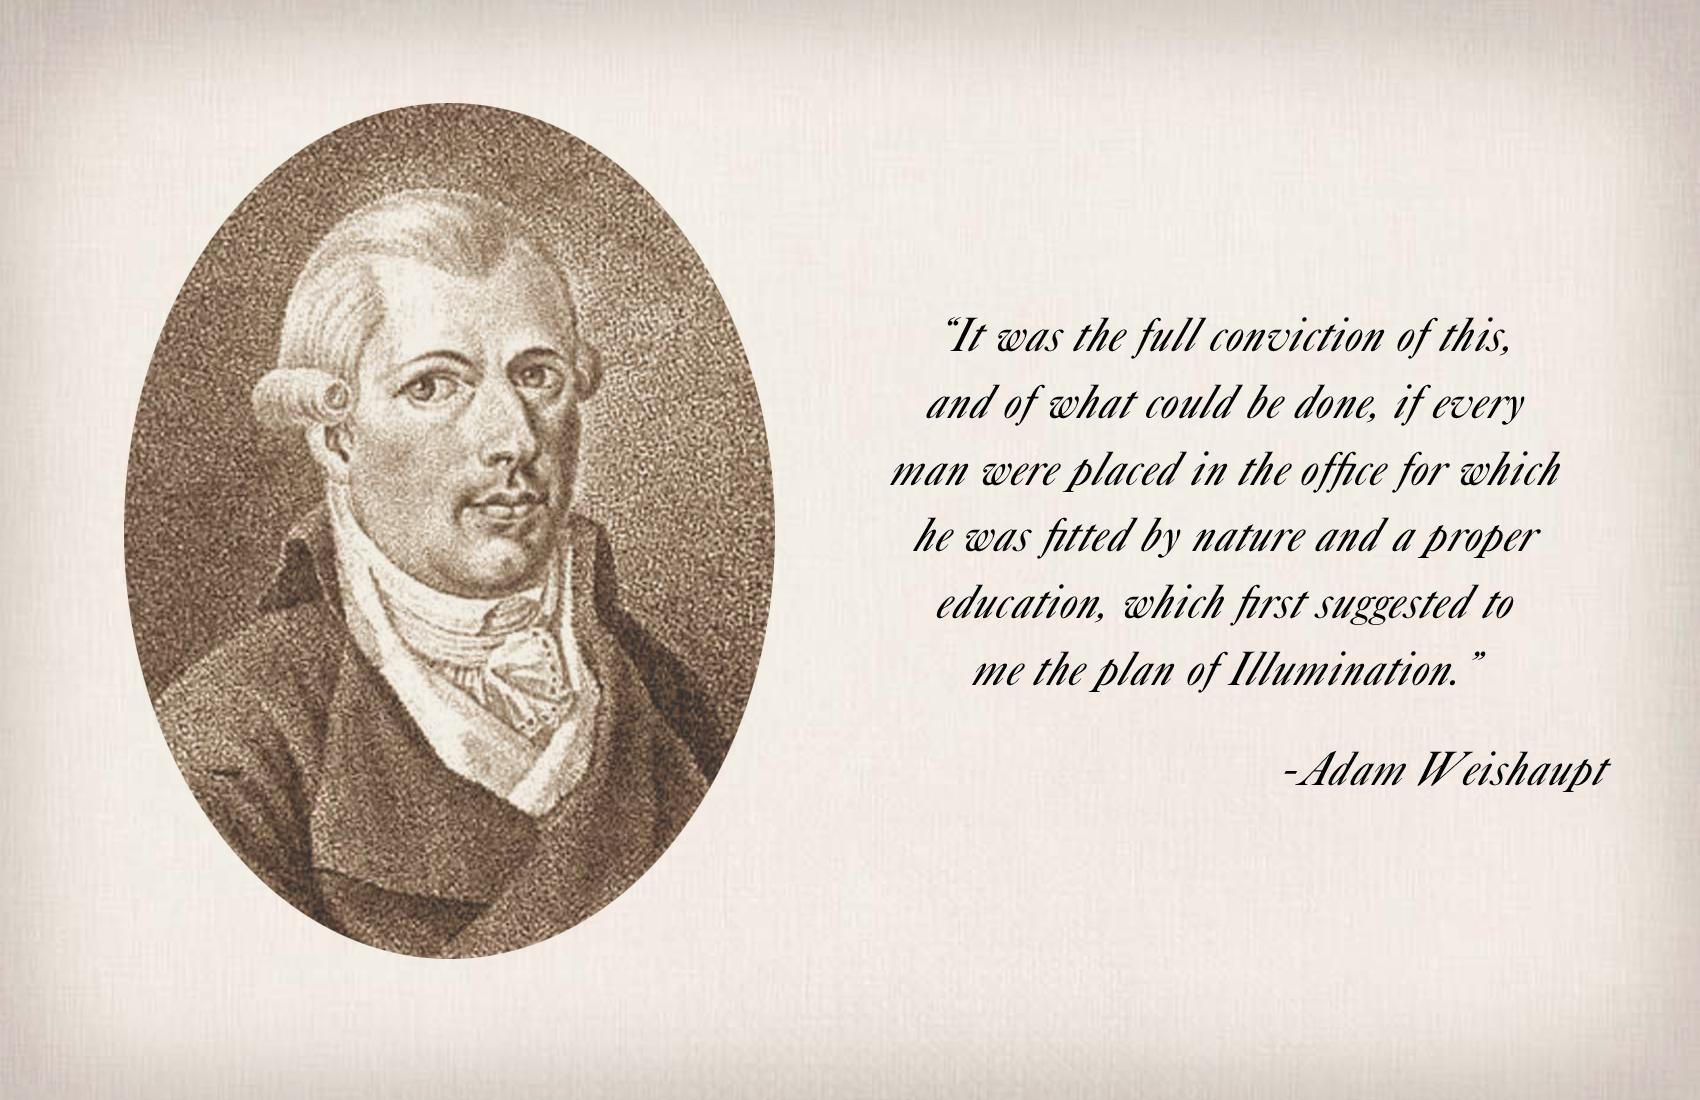 Adam Weishaupt's quote #3